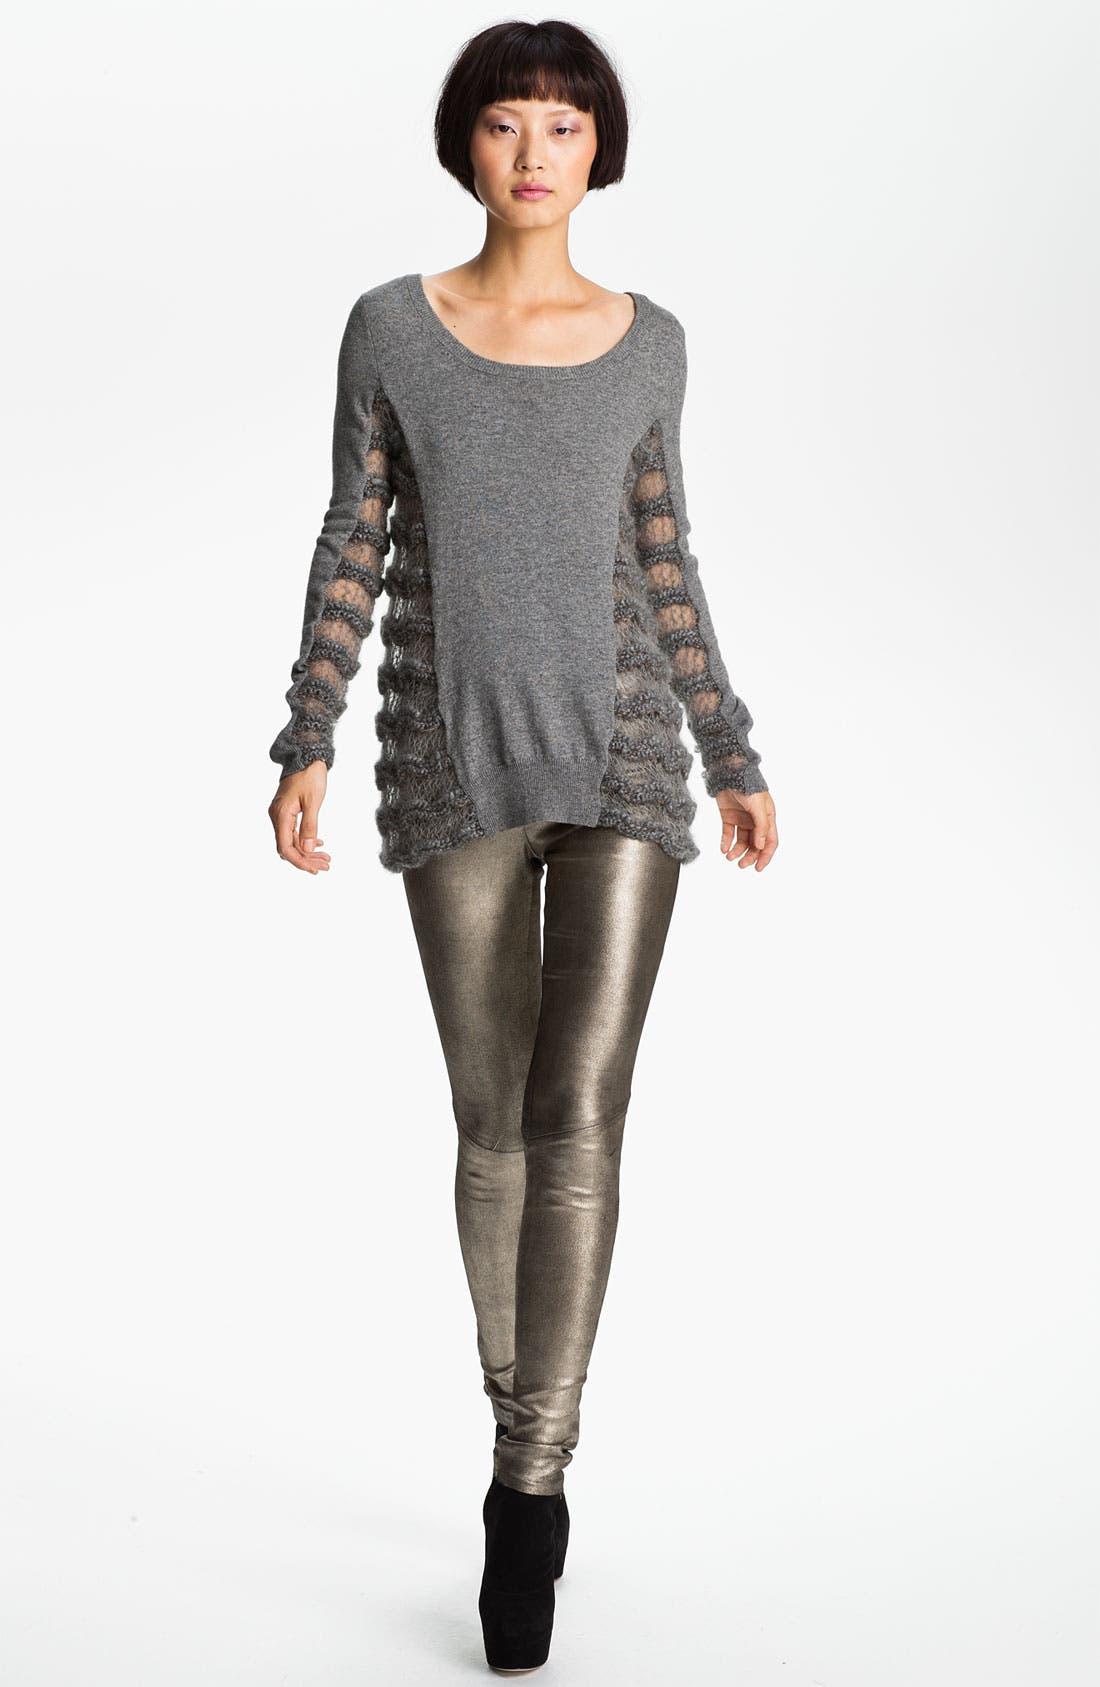 Alternate Image 1 Selected - Skaist-Taylor Drop Stitch Sweater